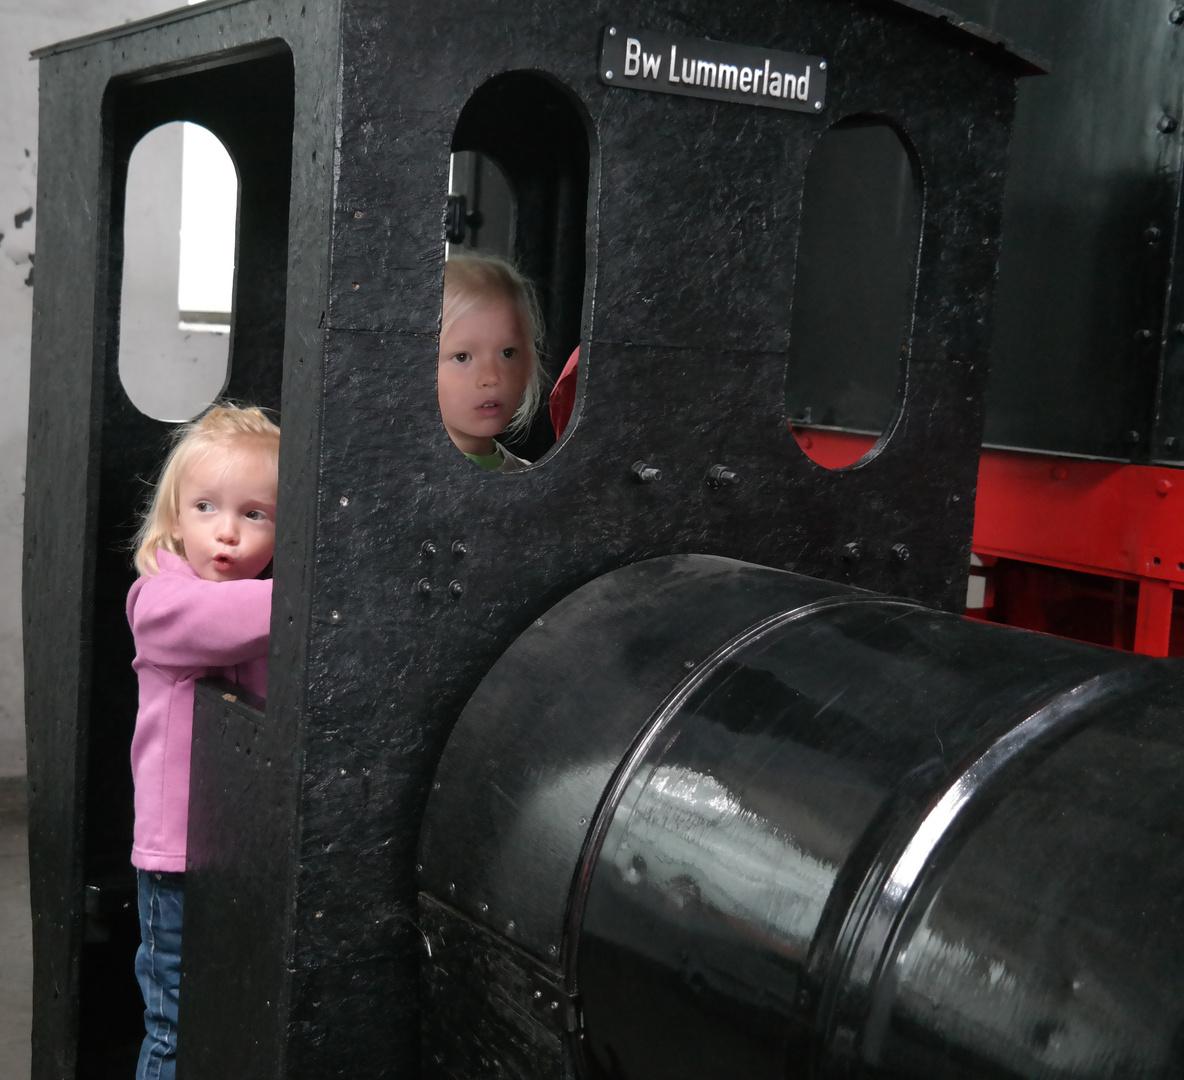 Die Kleine simuliert die Dampflokpfeife perfekt.